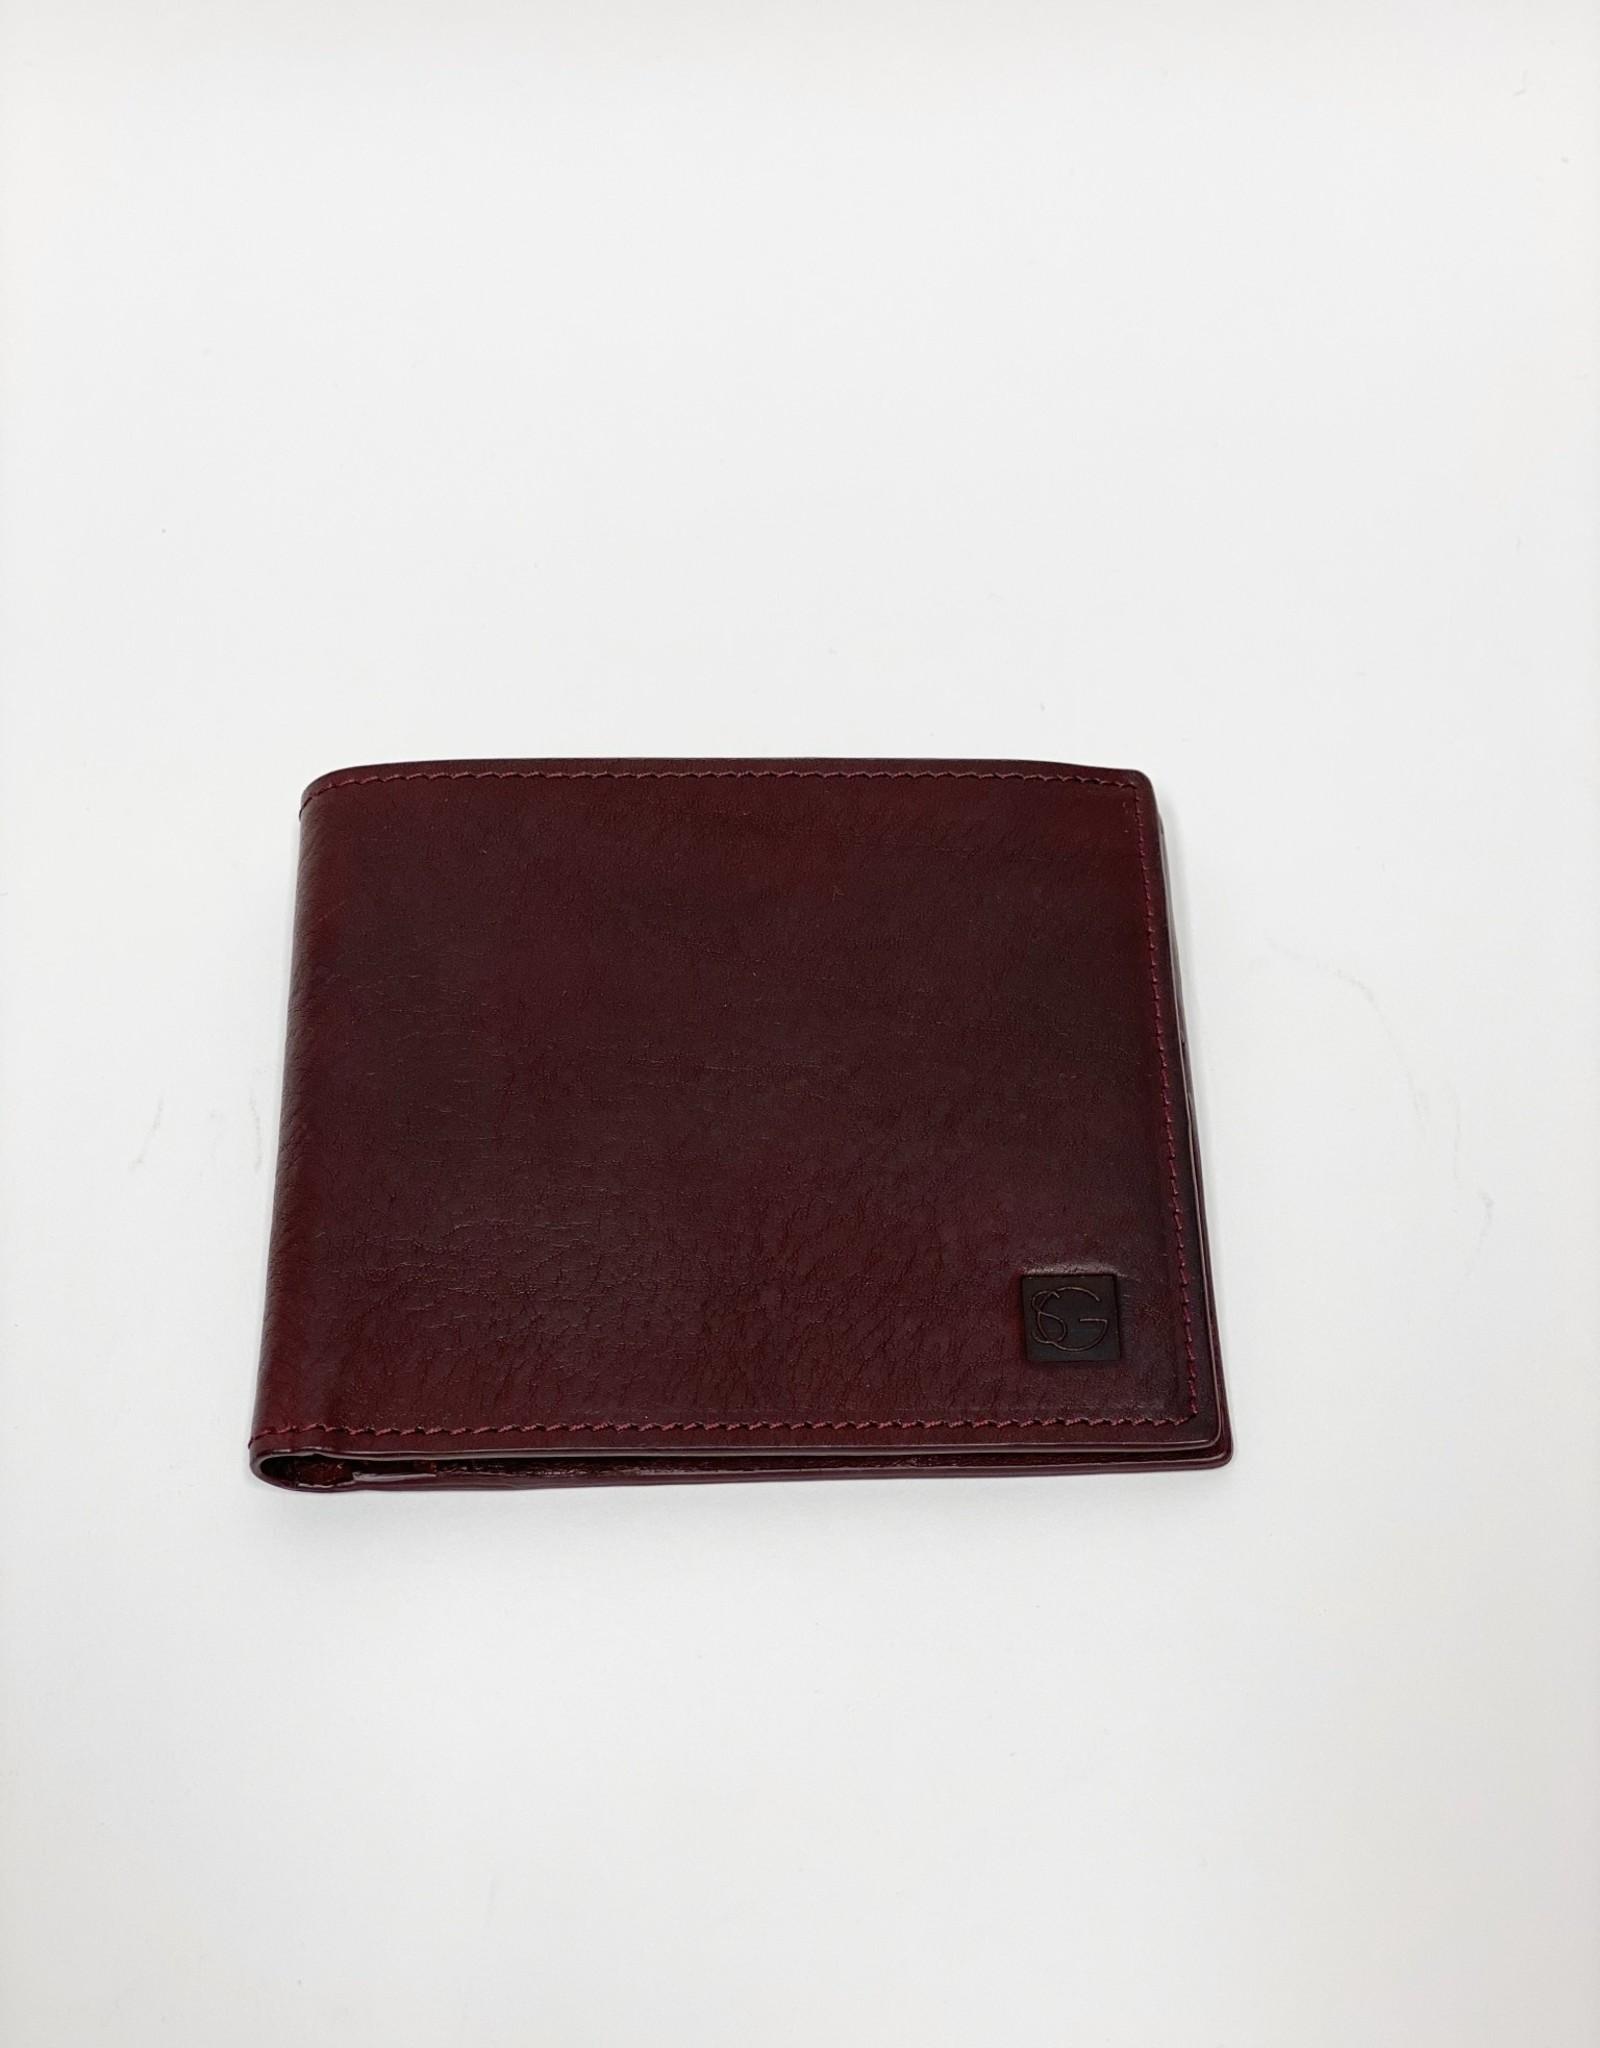 Sergio Gavazzeni Leather Wallet